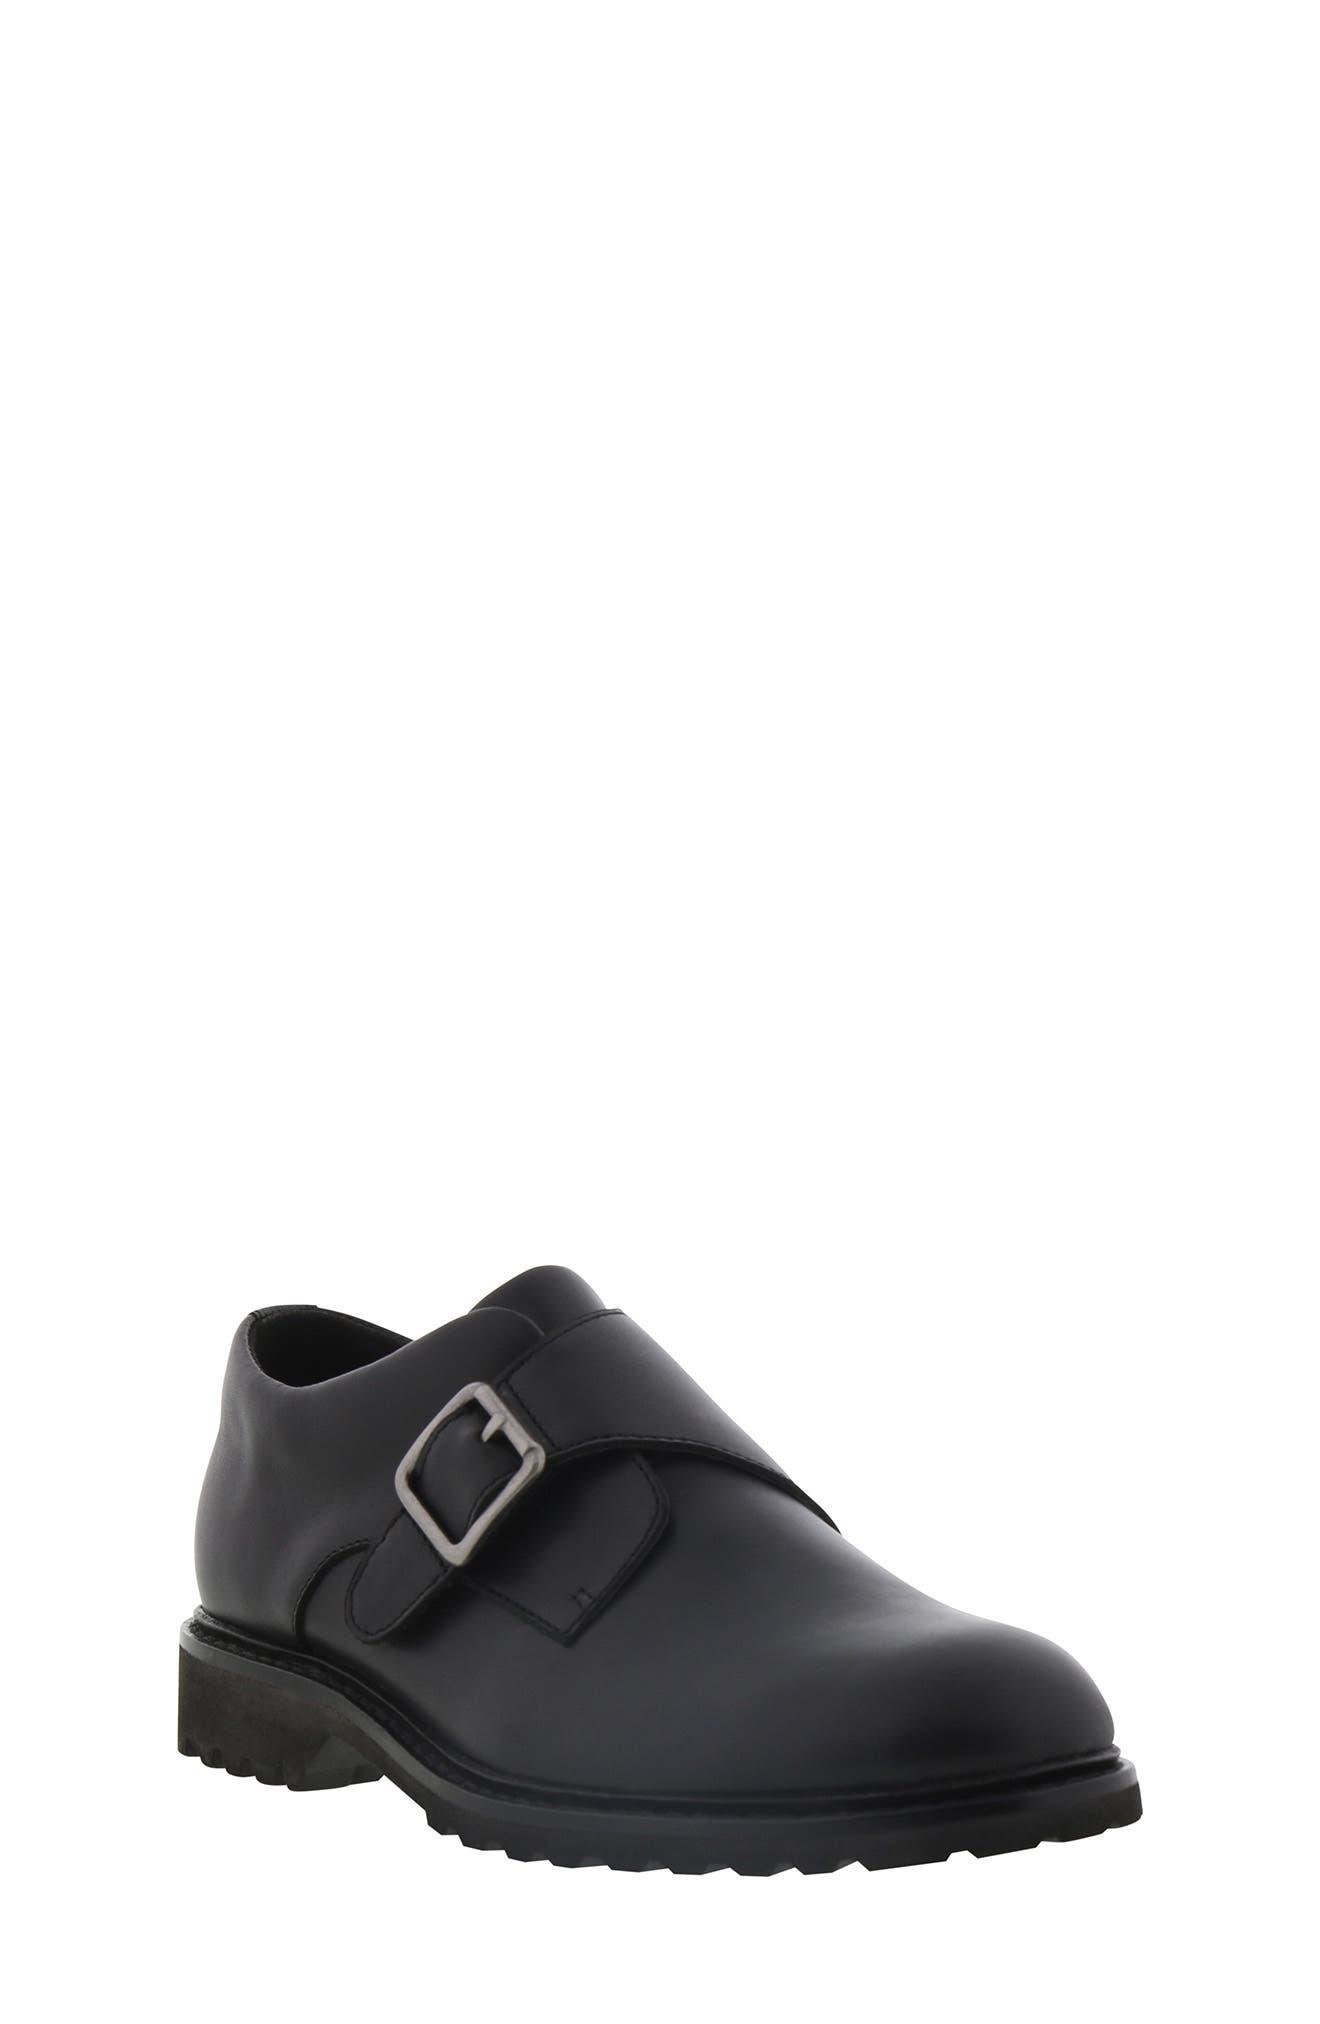 Boys Kenneth Cole Wing Monk Shoe Size 35 M  Black